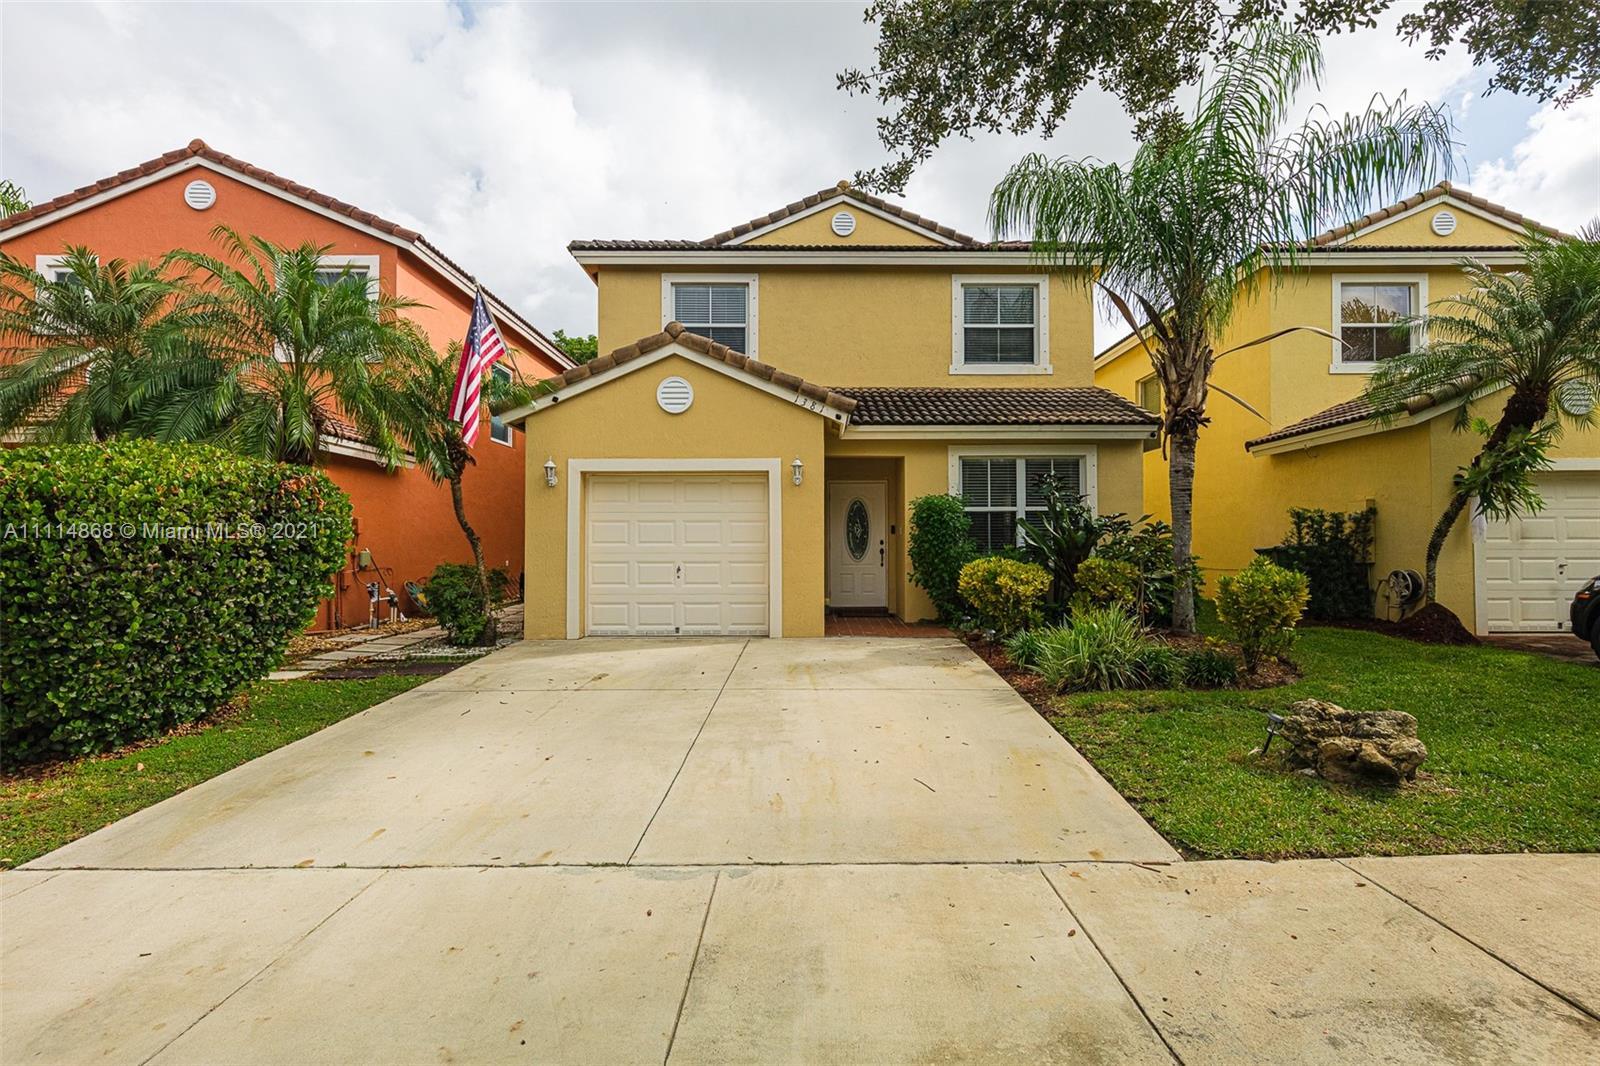 Single Family Home For Sale SHORES AT KEYS GATE1,693 Sqft